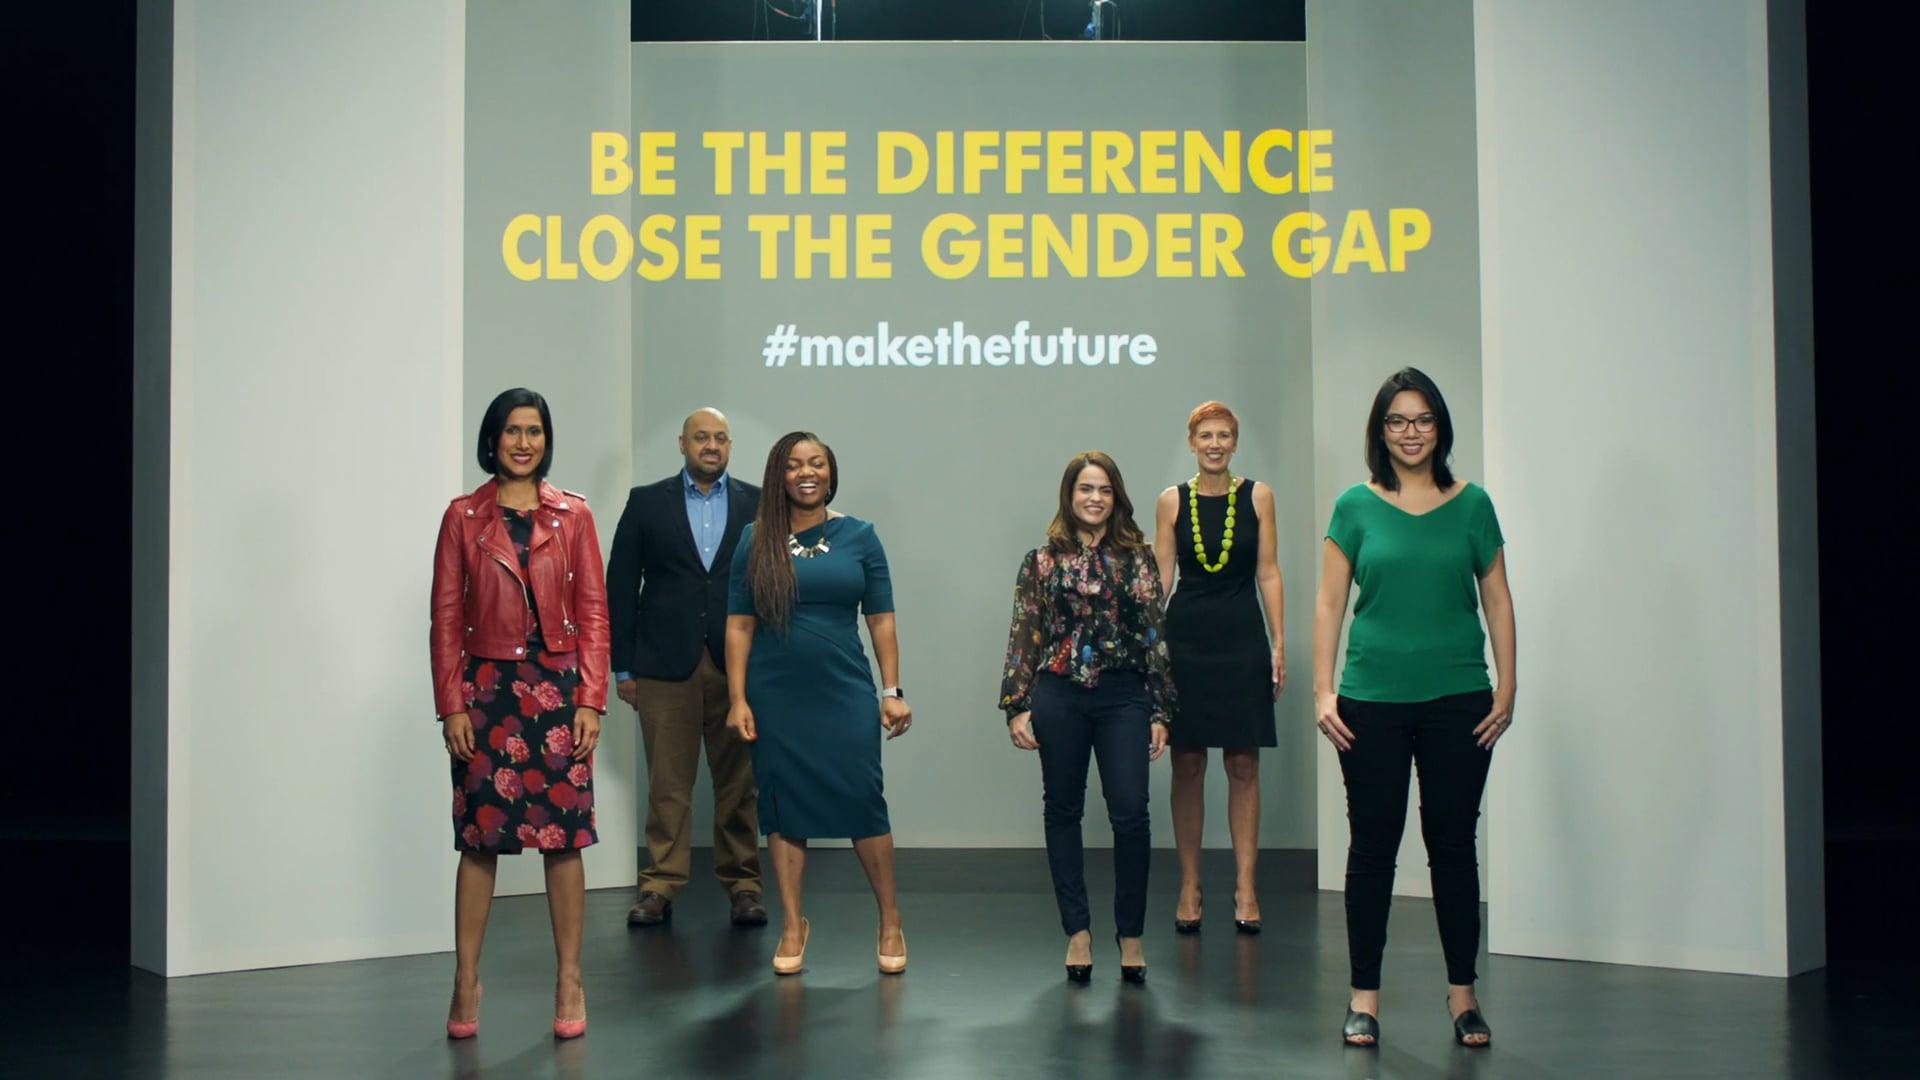 Close the Gender Gap - Manifesto